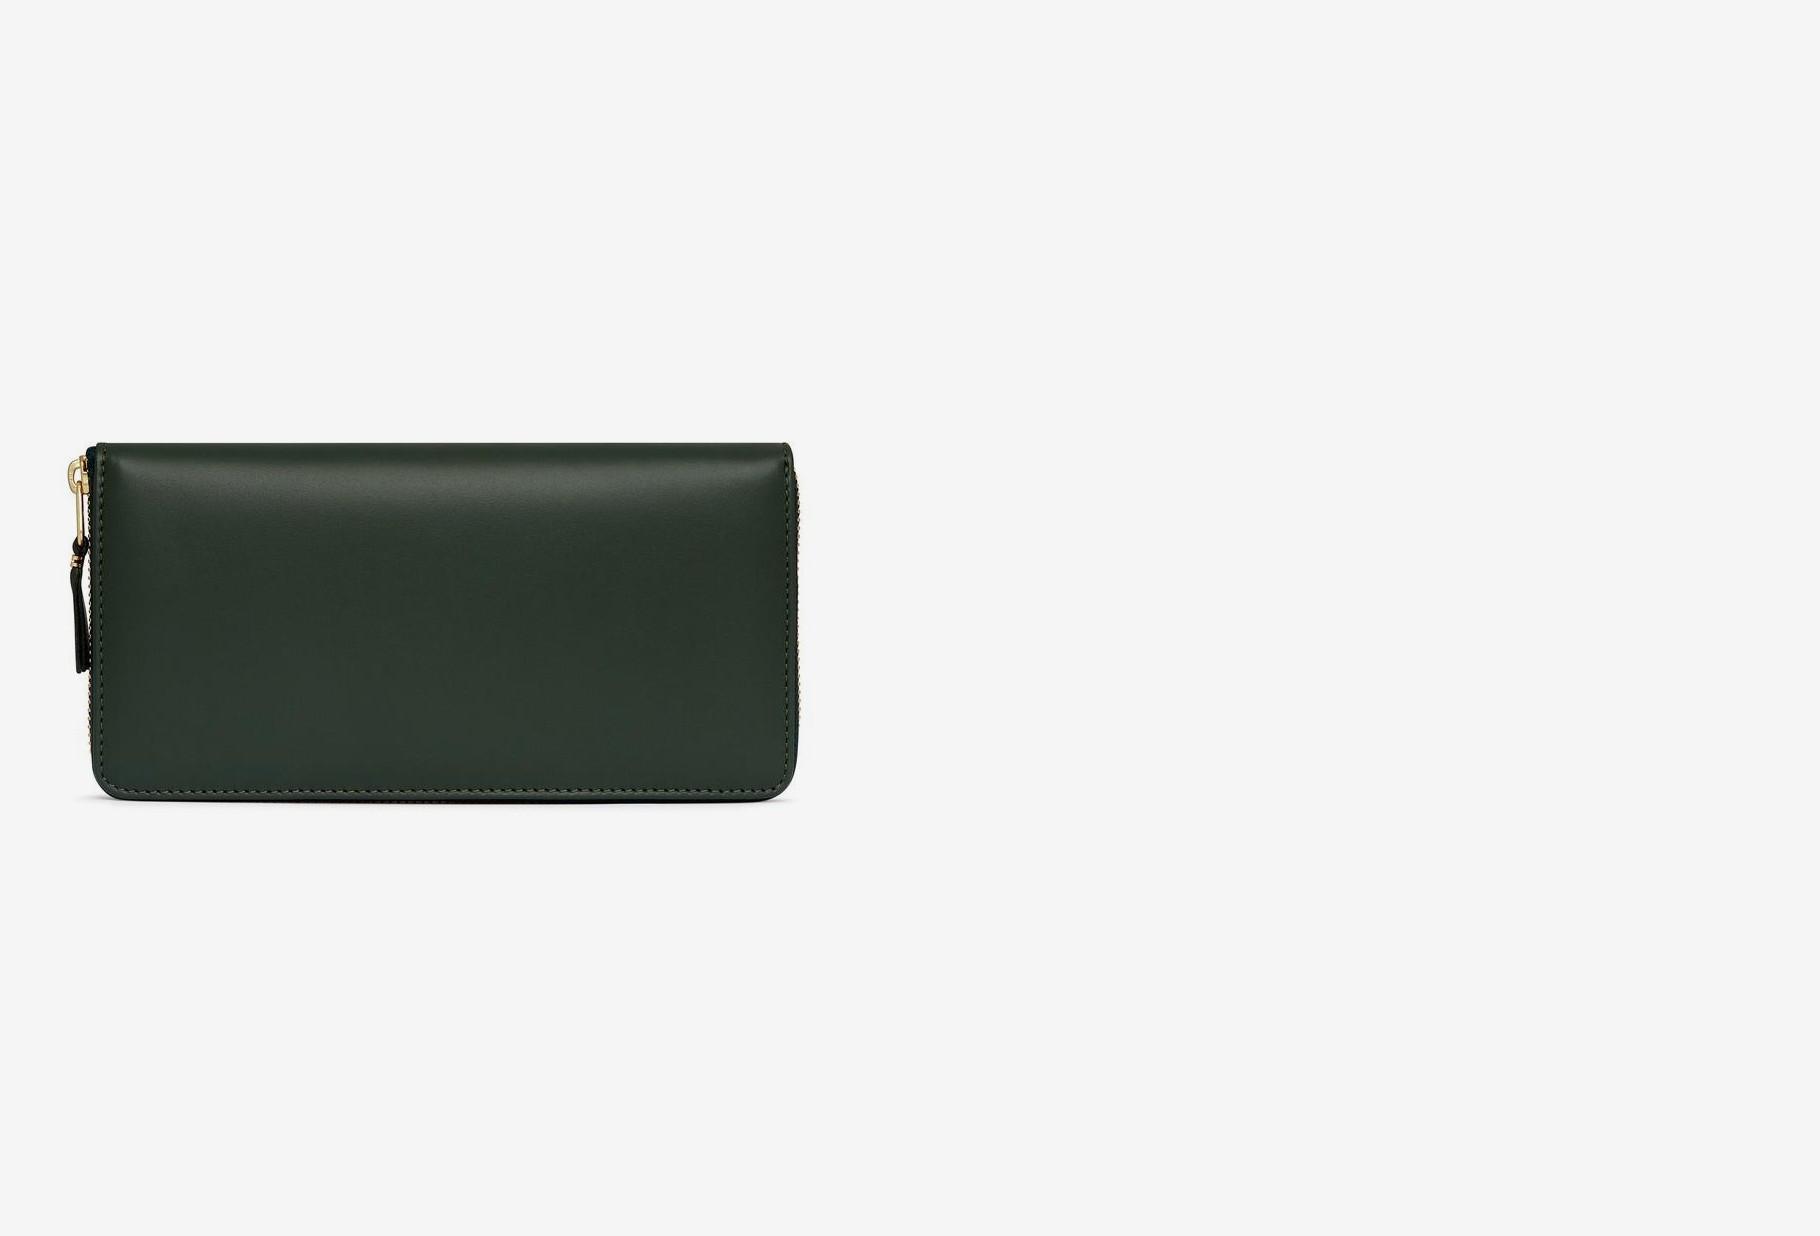 COMME DES GARÇONS WALLETS / Cdg leather wallet classic Sa0110 bottle green